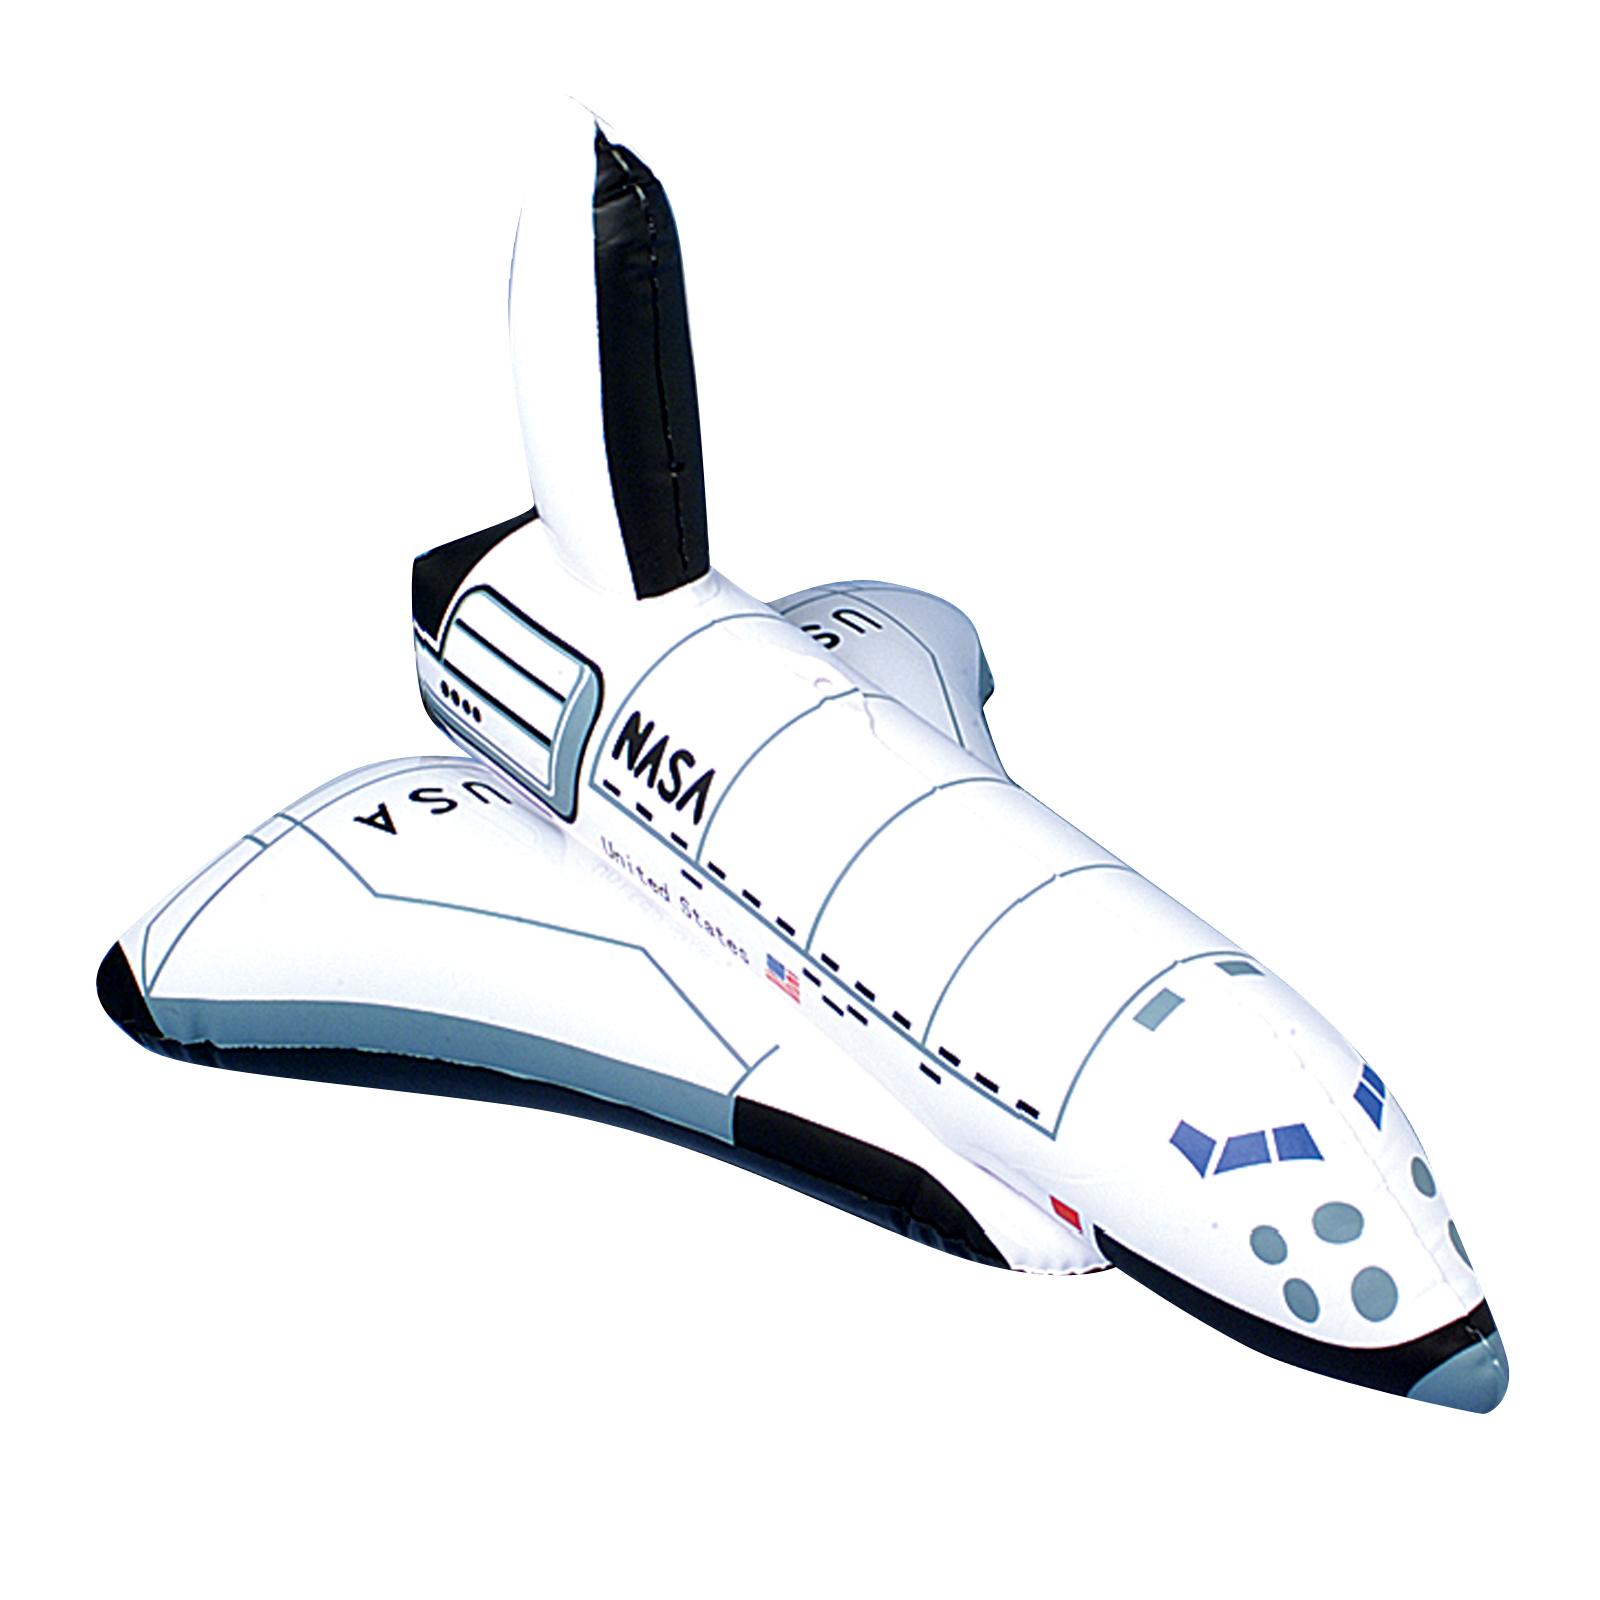 Free rocketship cliparts download. Spaceship clipart realistic